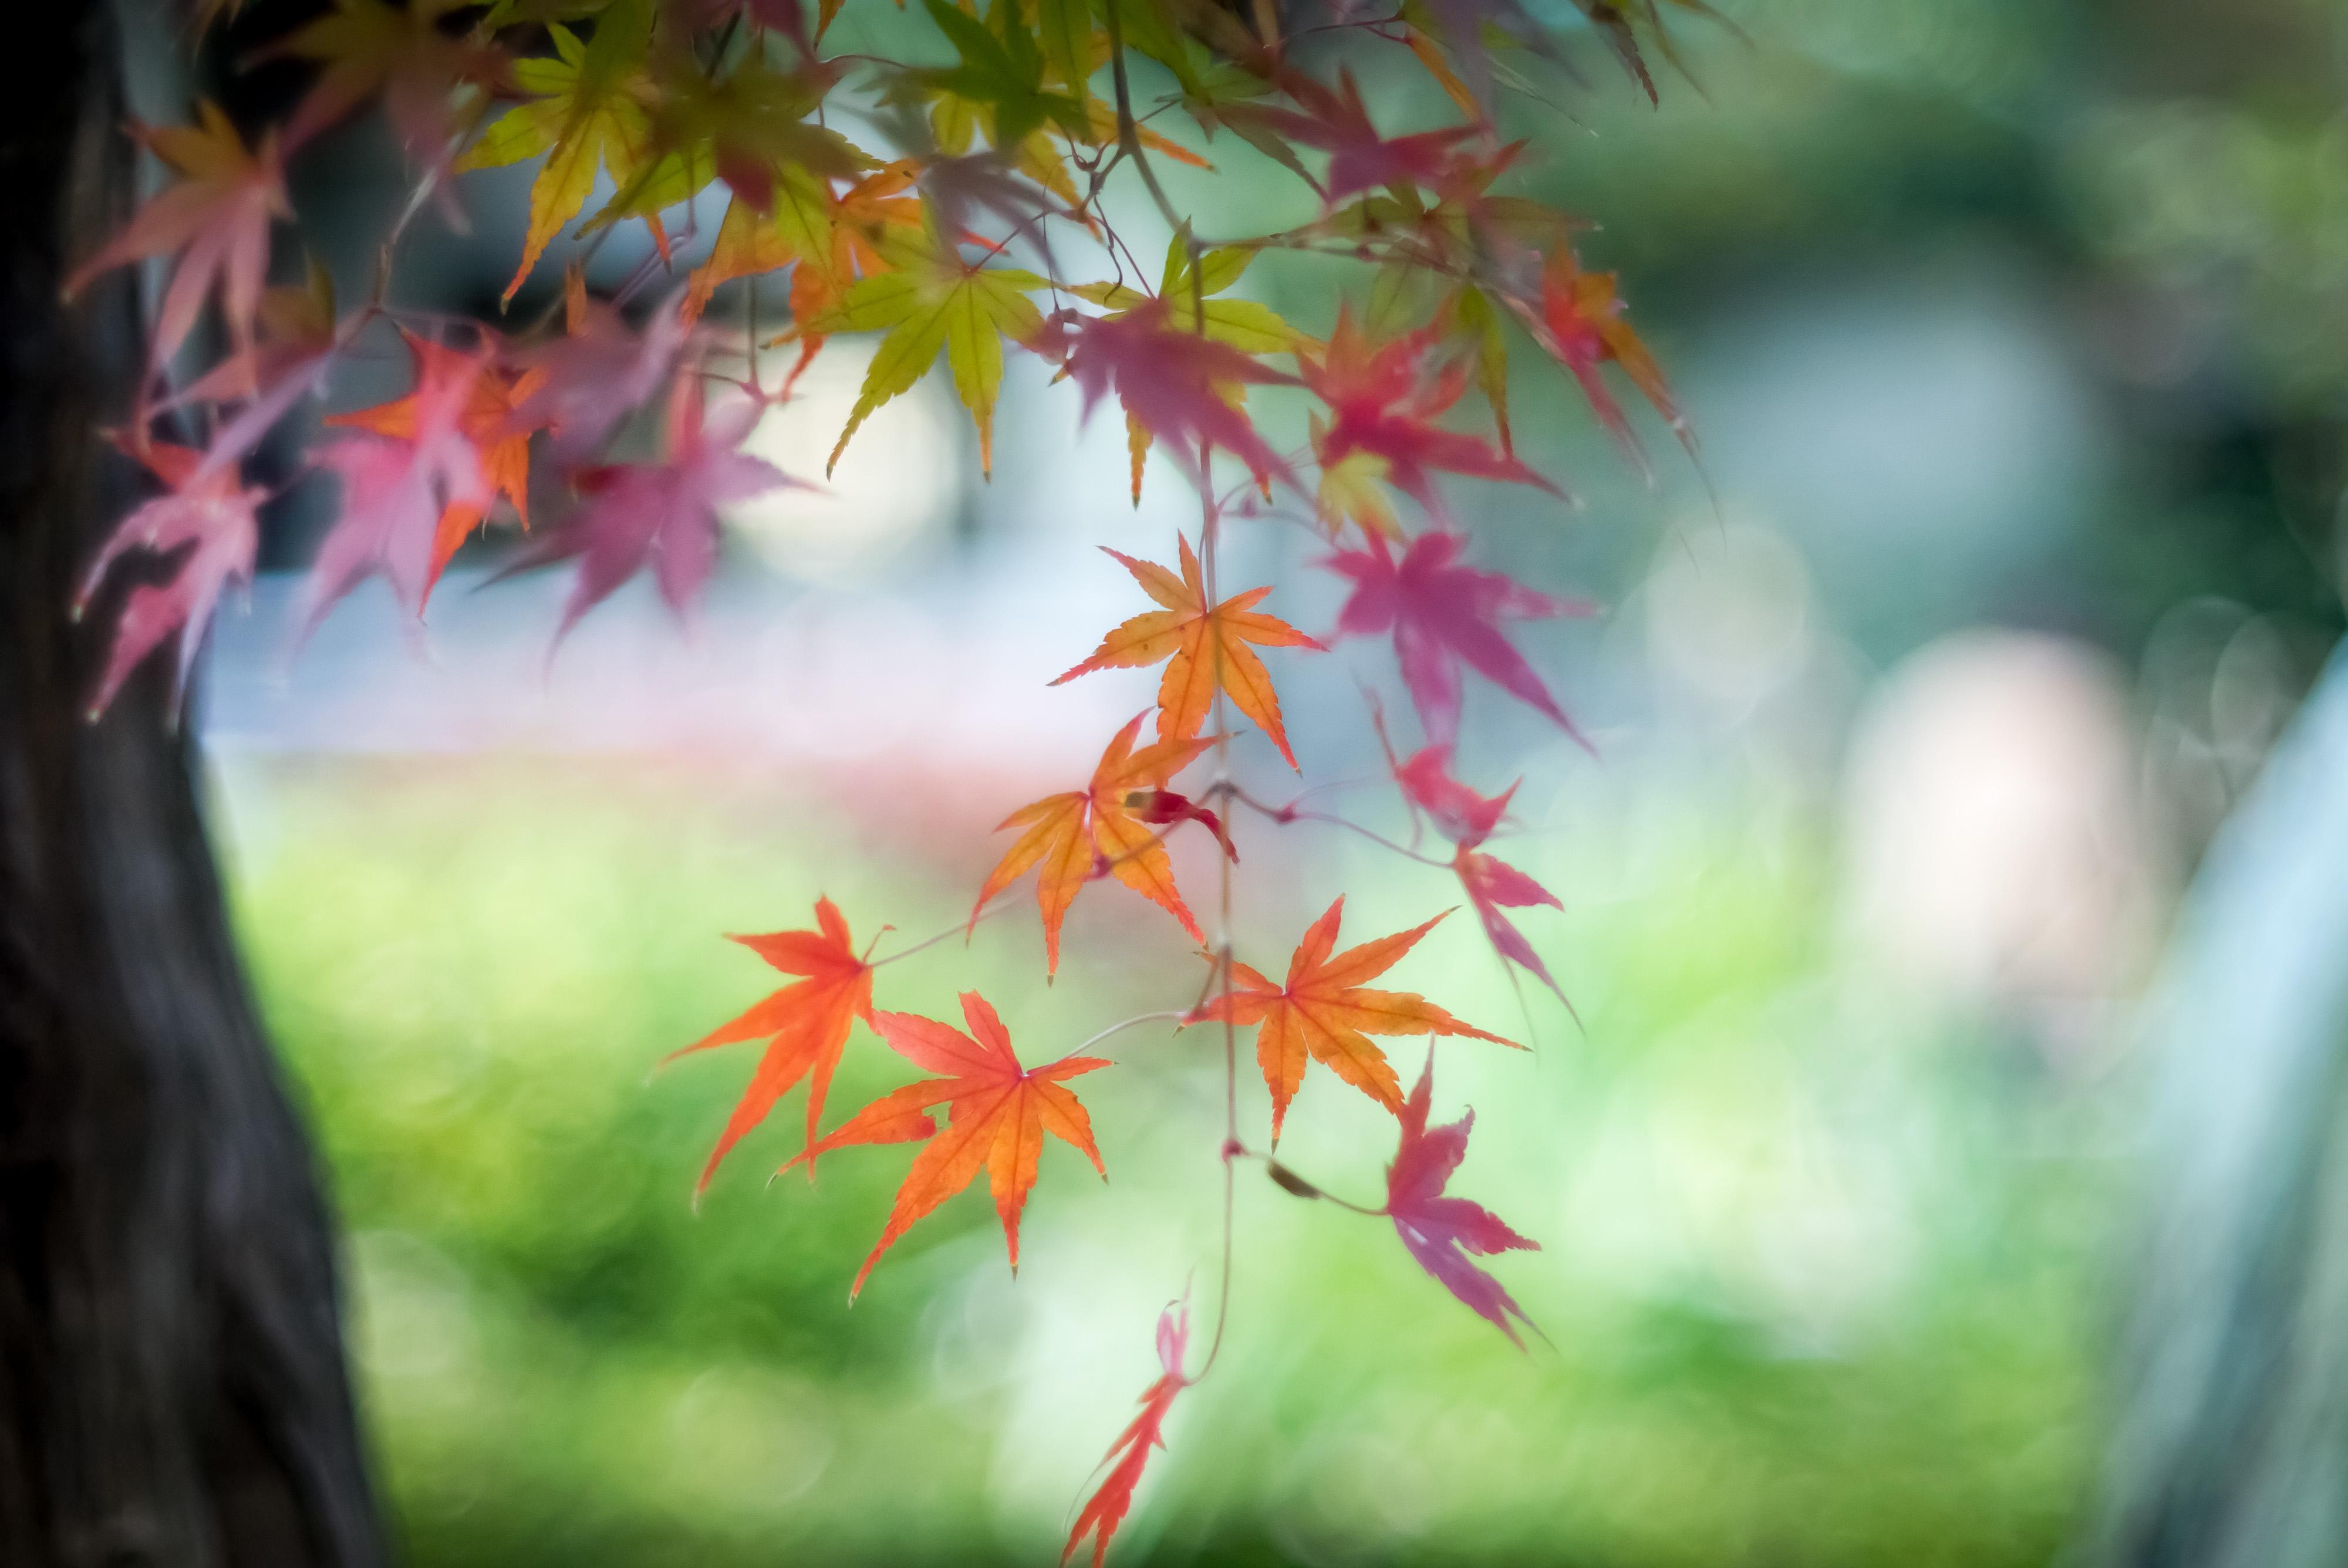 Wallpaper : Japan, sunlight, leaves, nature, grass, branch, green ...